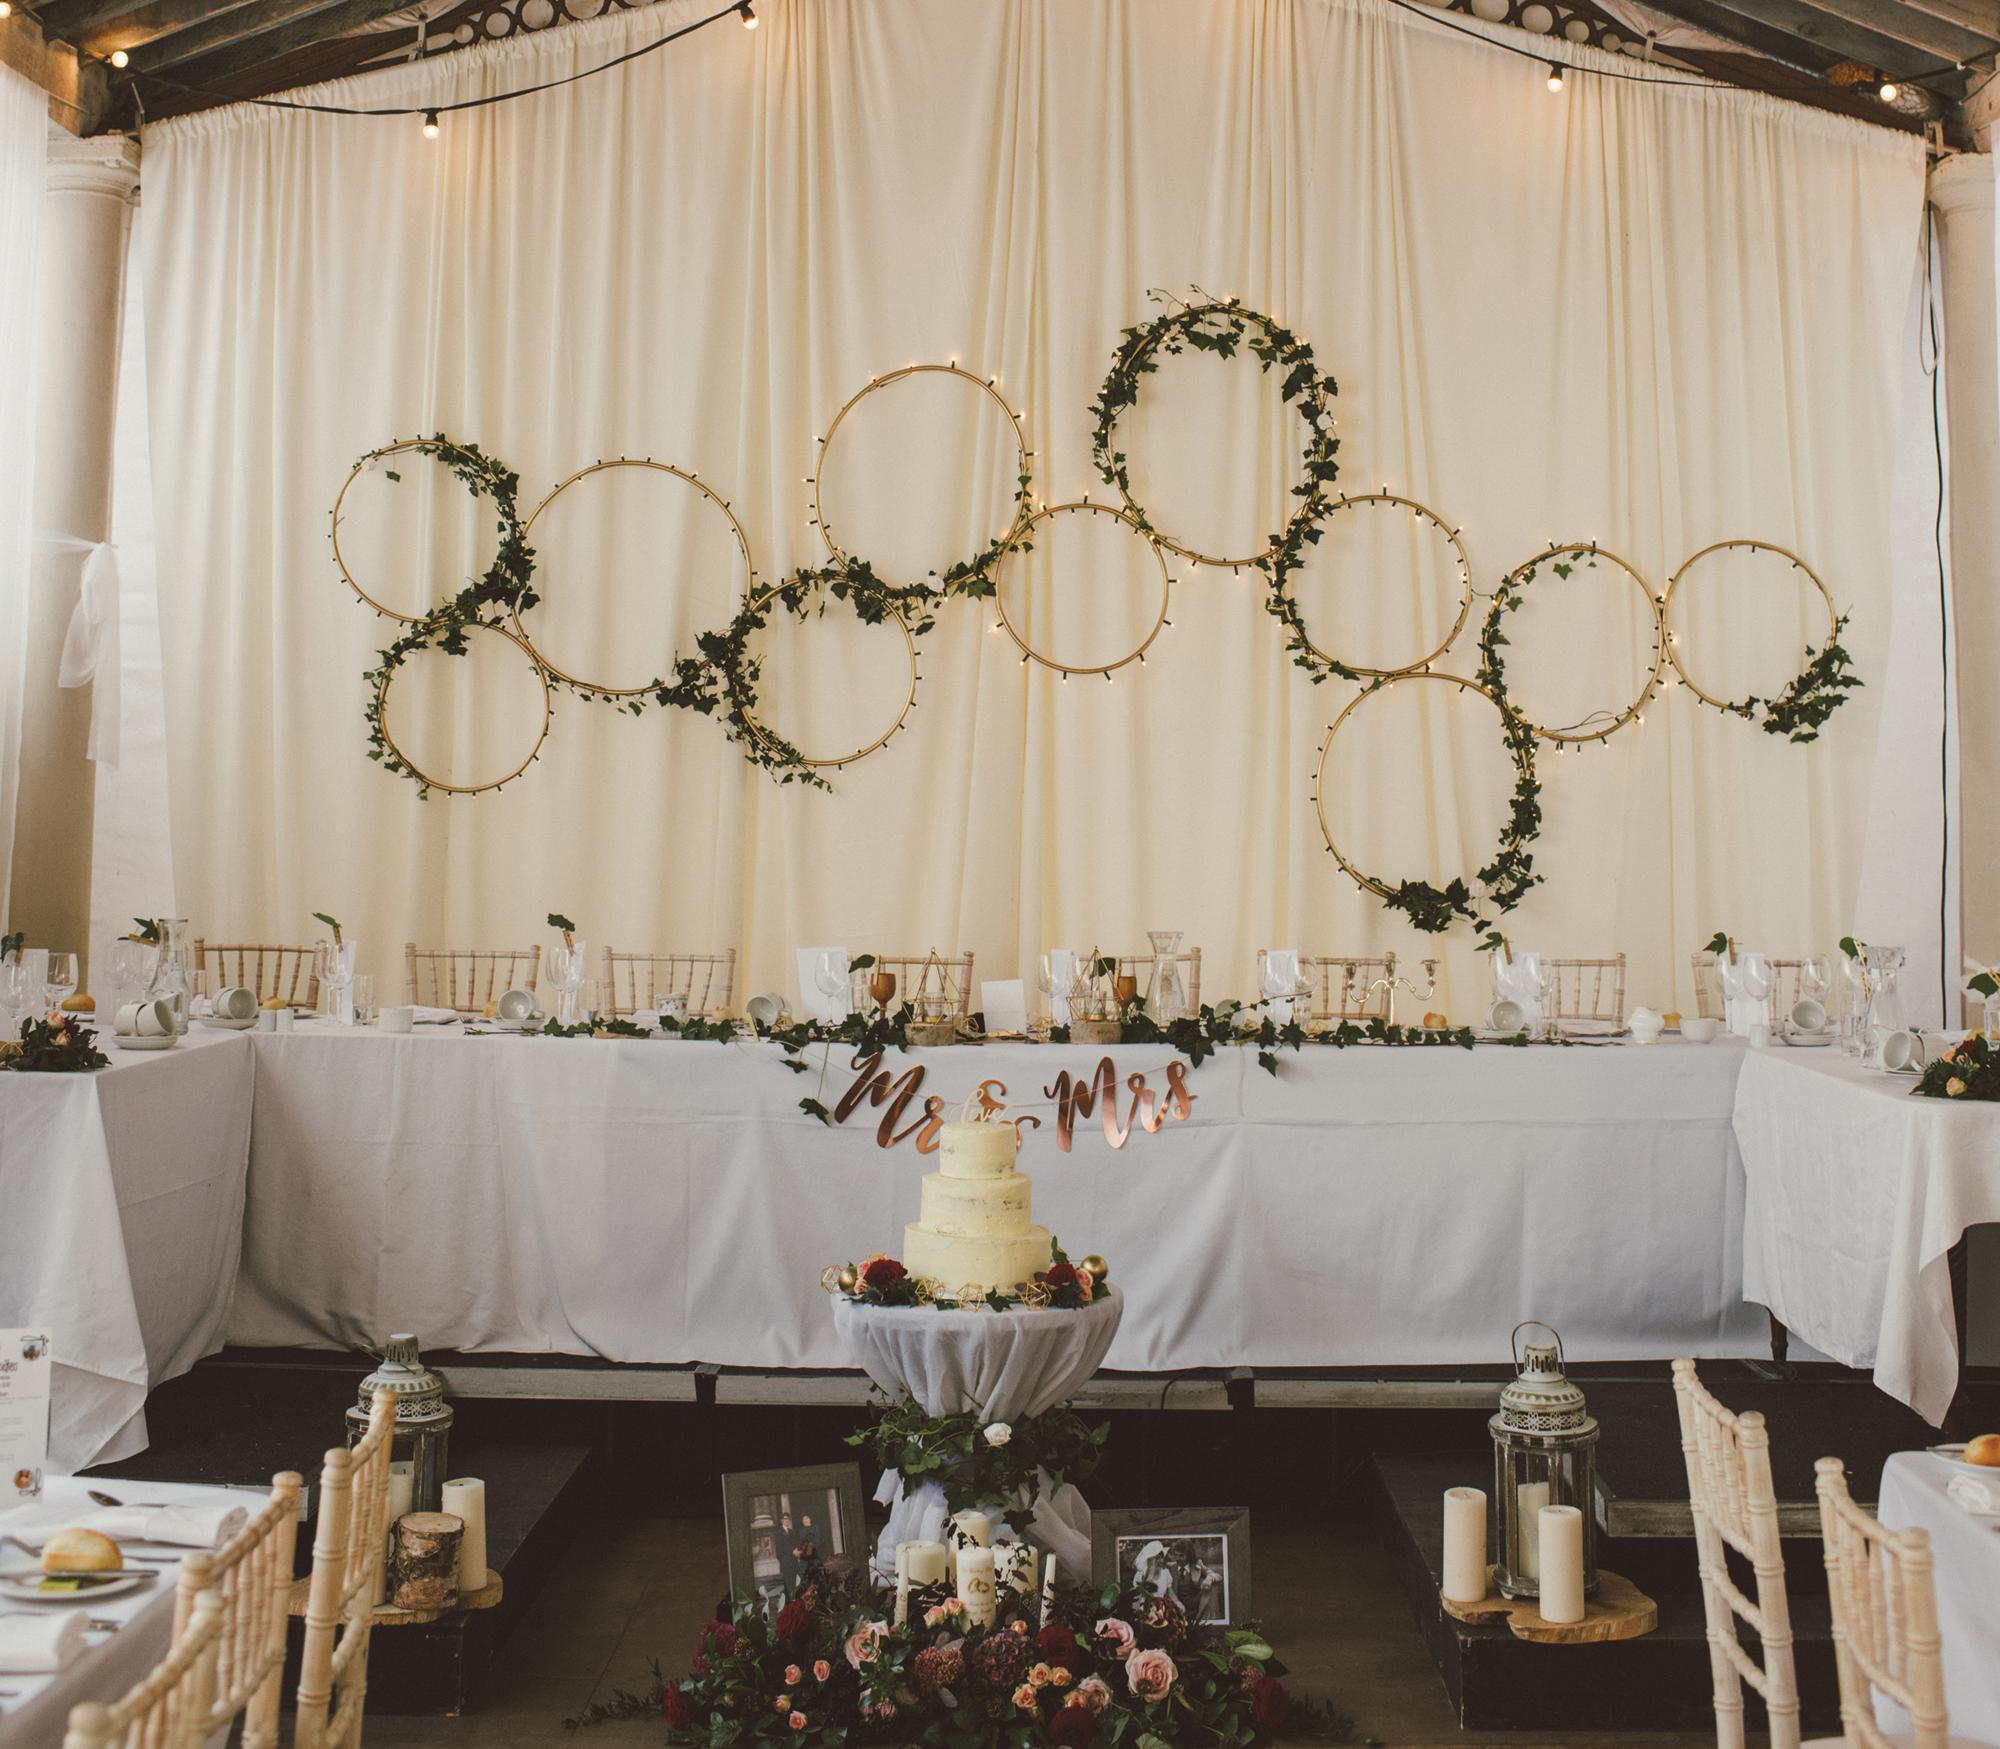 floral-hoops-wedding-styling-irish-wedding-venue.jpg